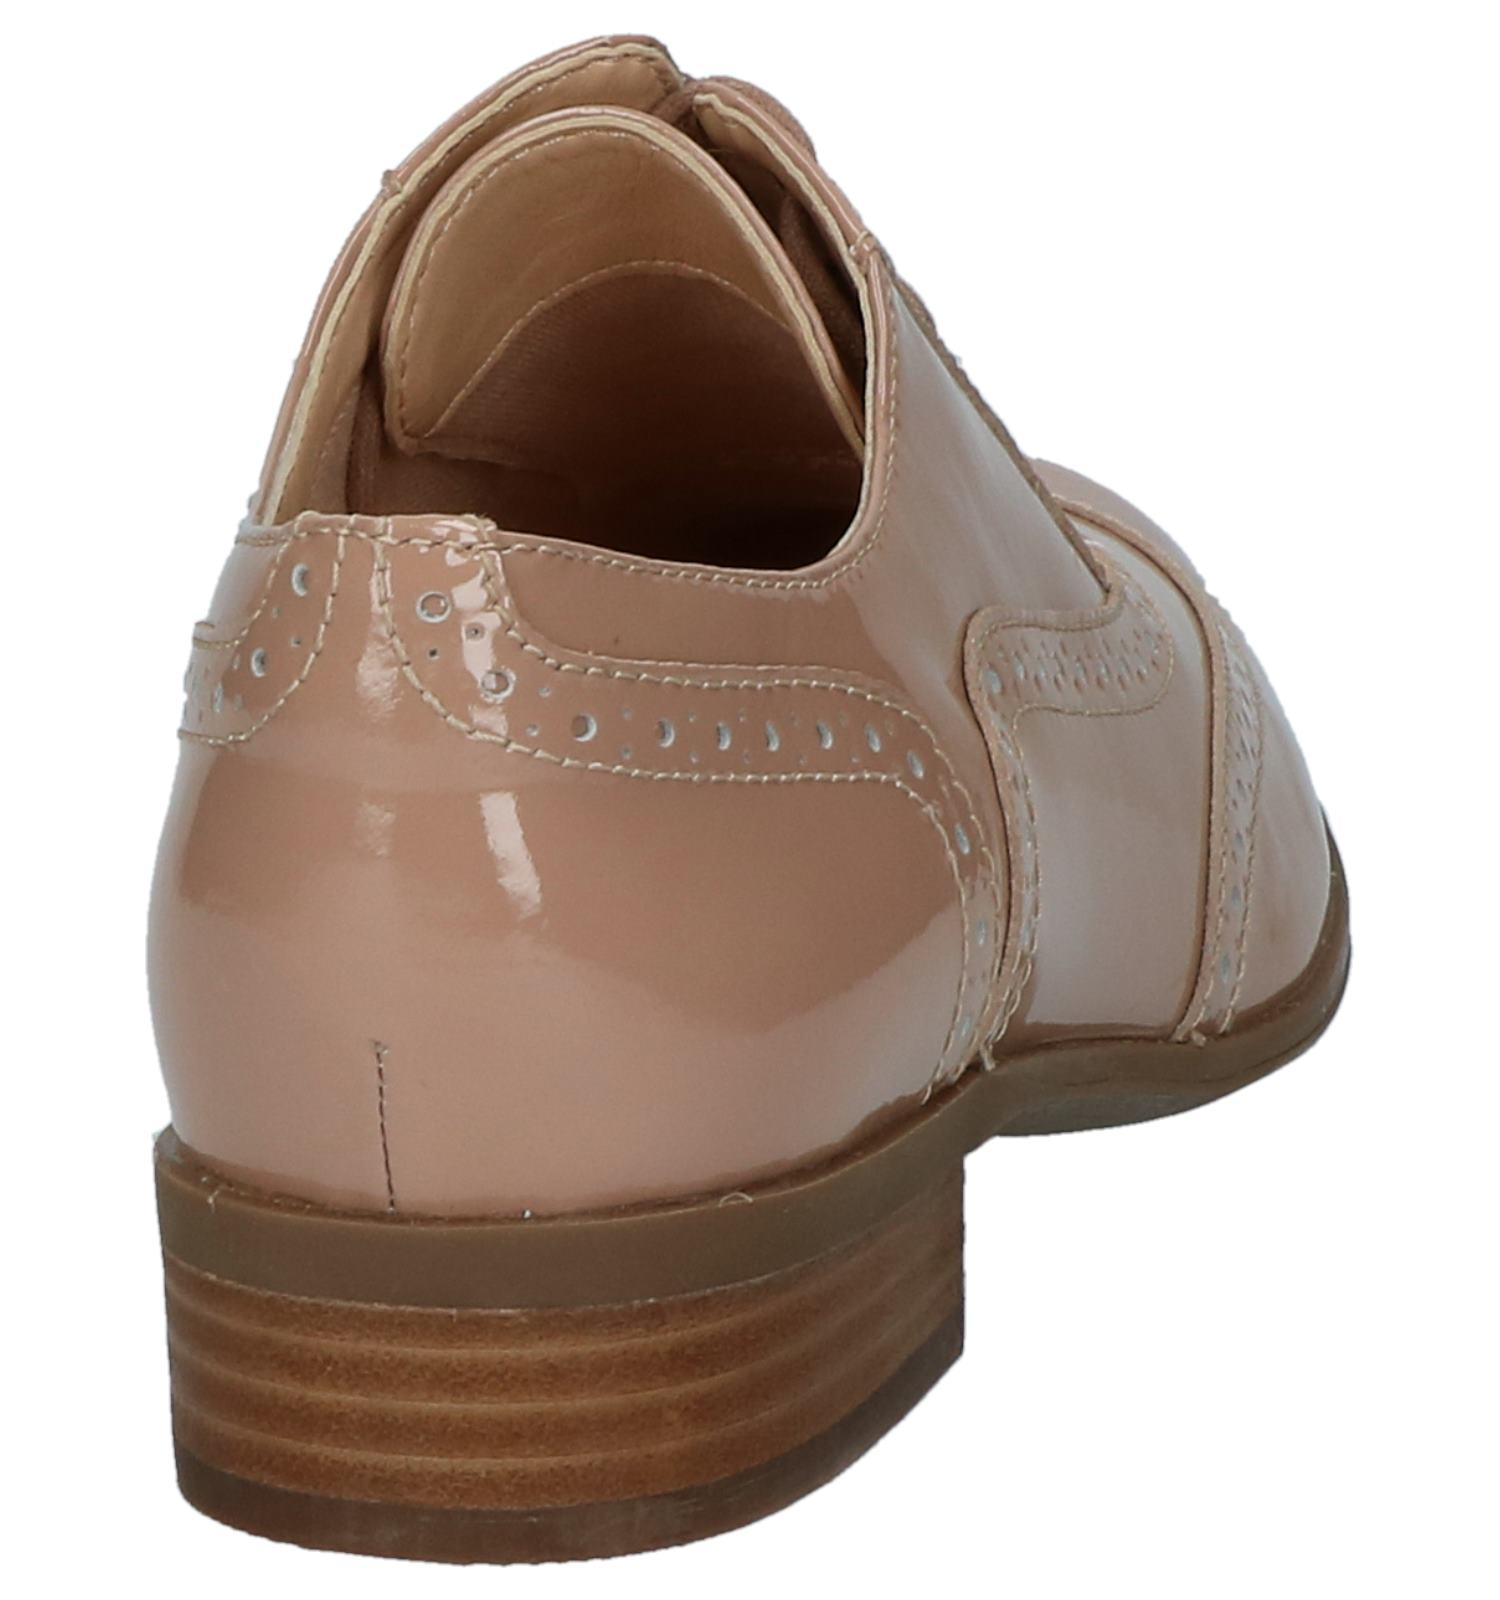 Hamble Roze Oak Veterschoenen Clarks Comfortabele q5ASc3RjL4